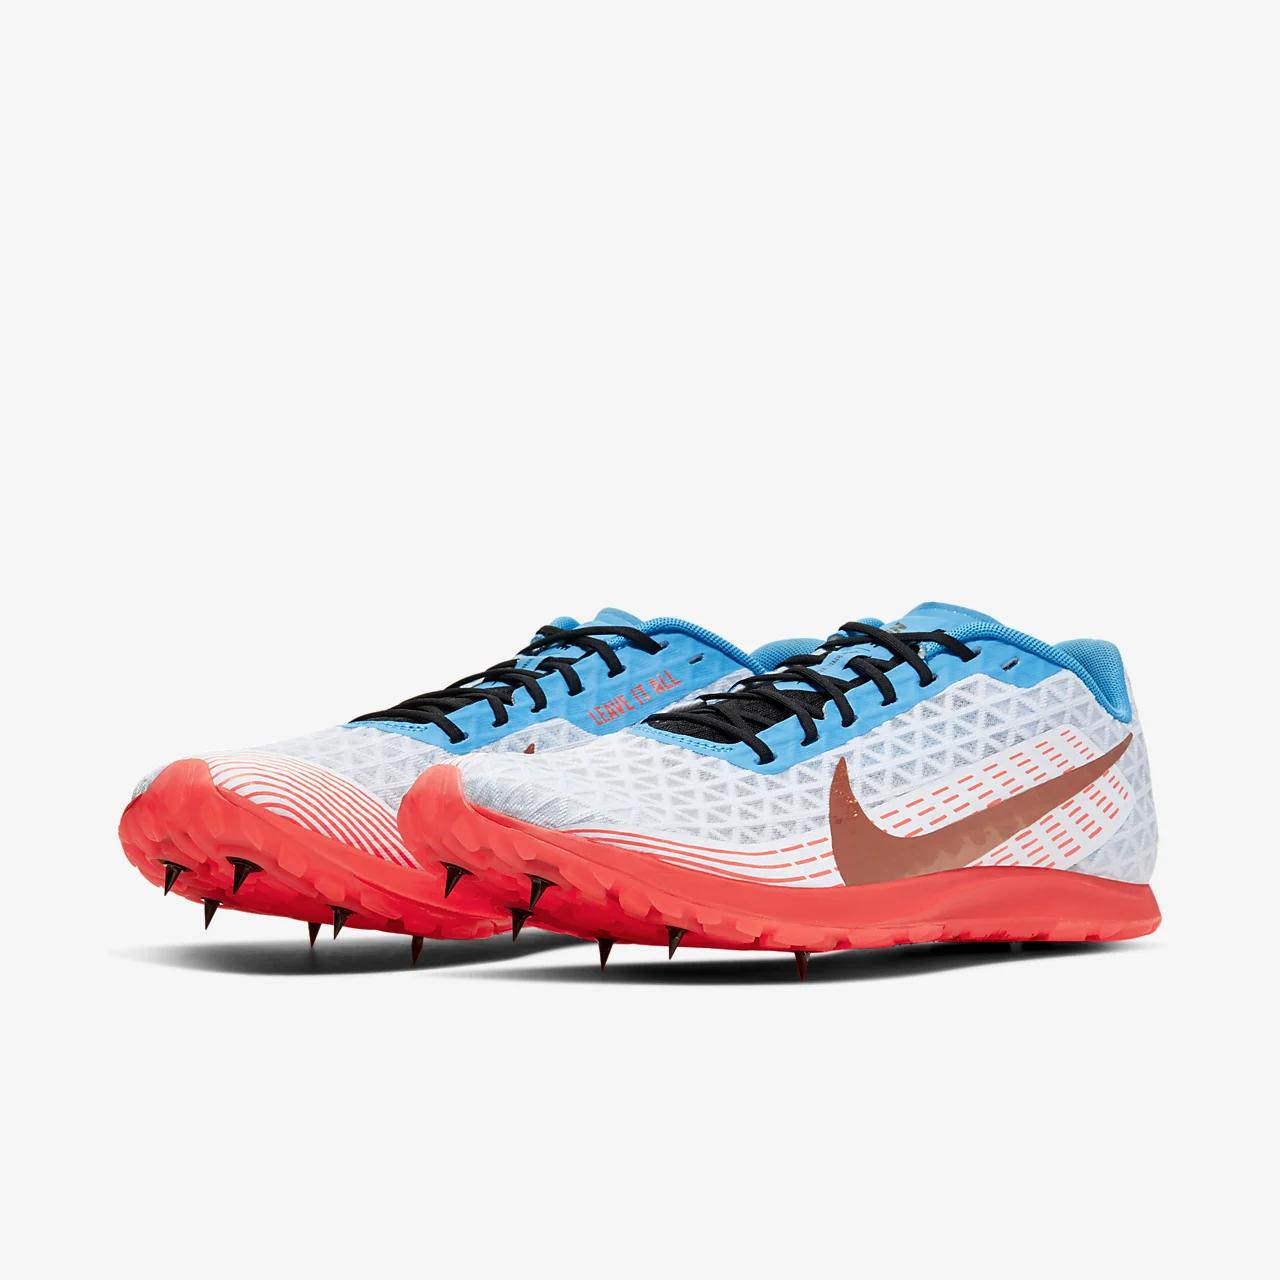 Nike Zoom Rival XC (2019) Unisex Track Spike AJ0851-401